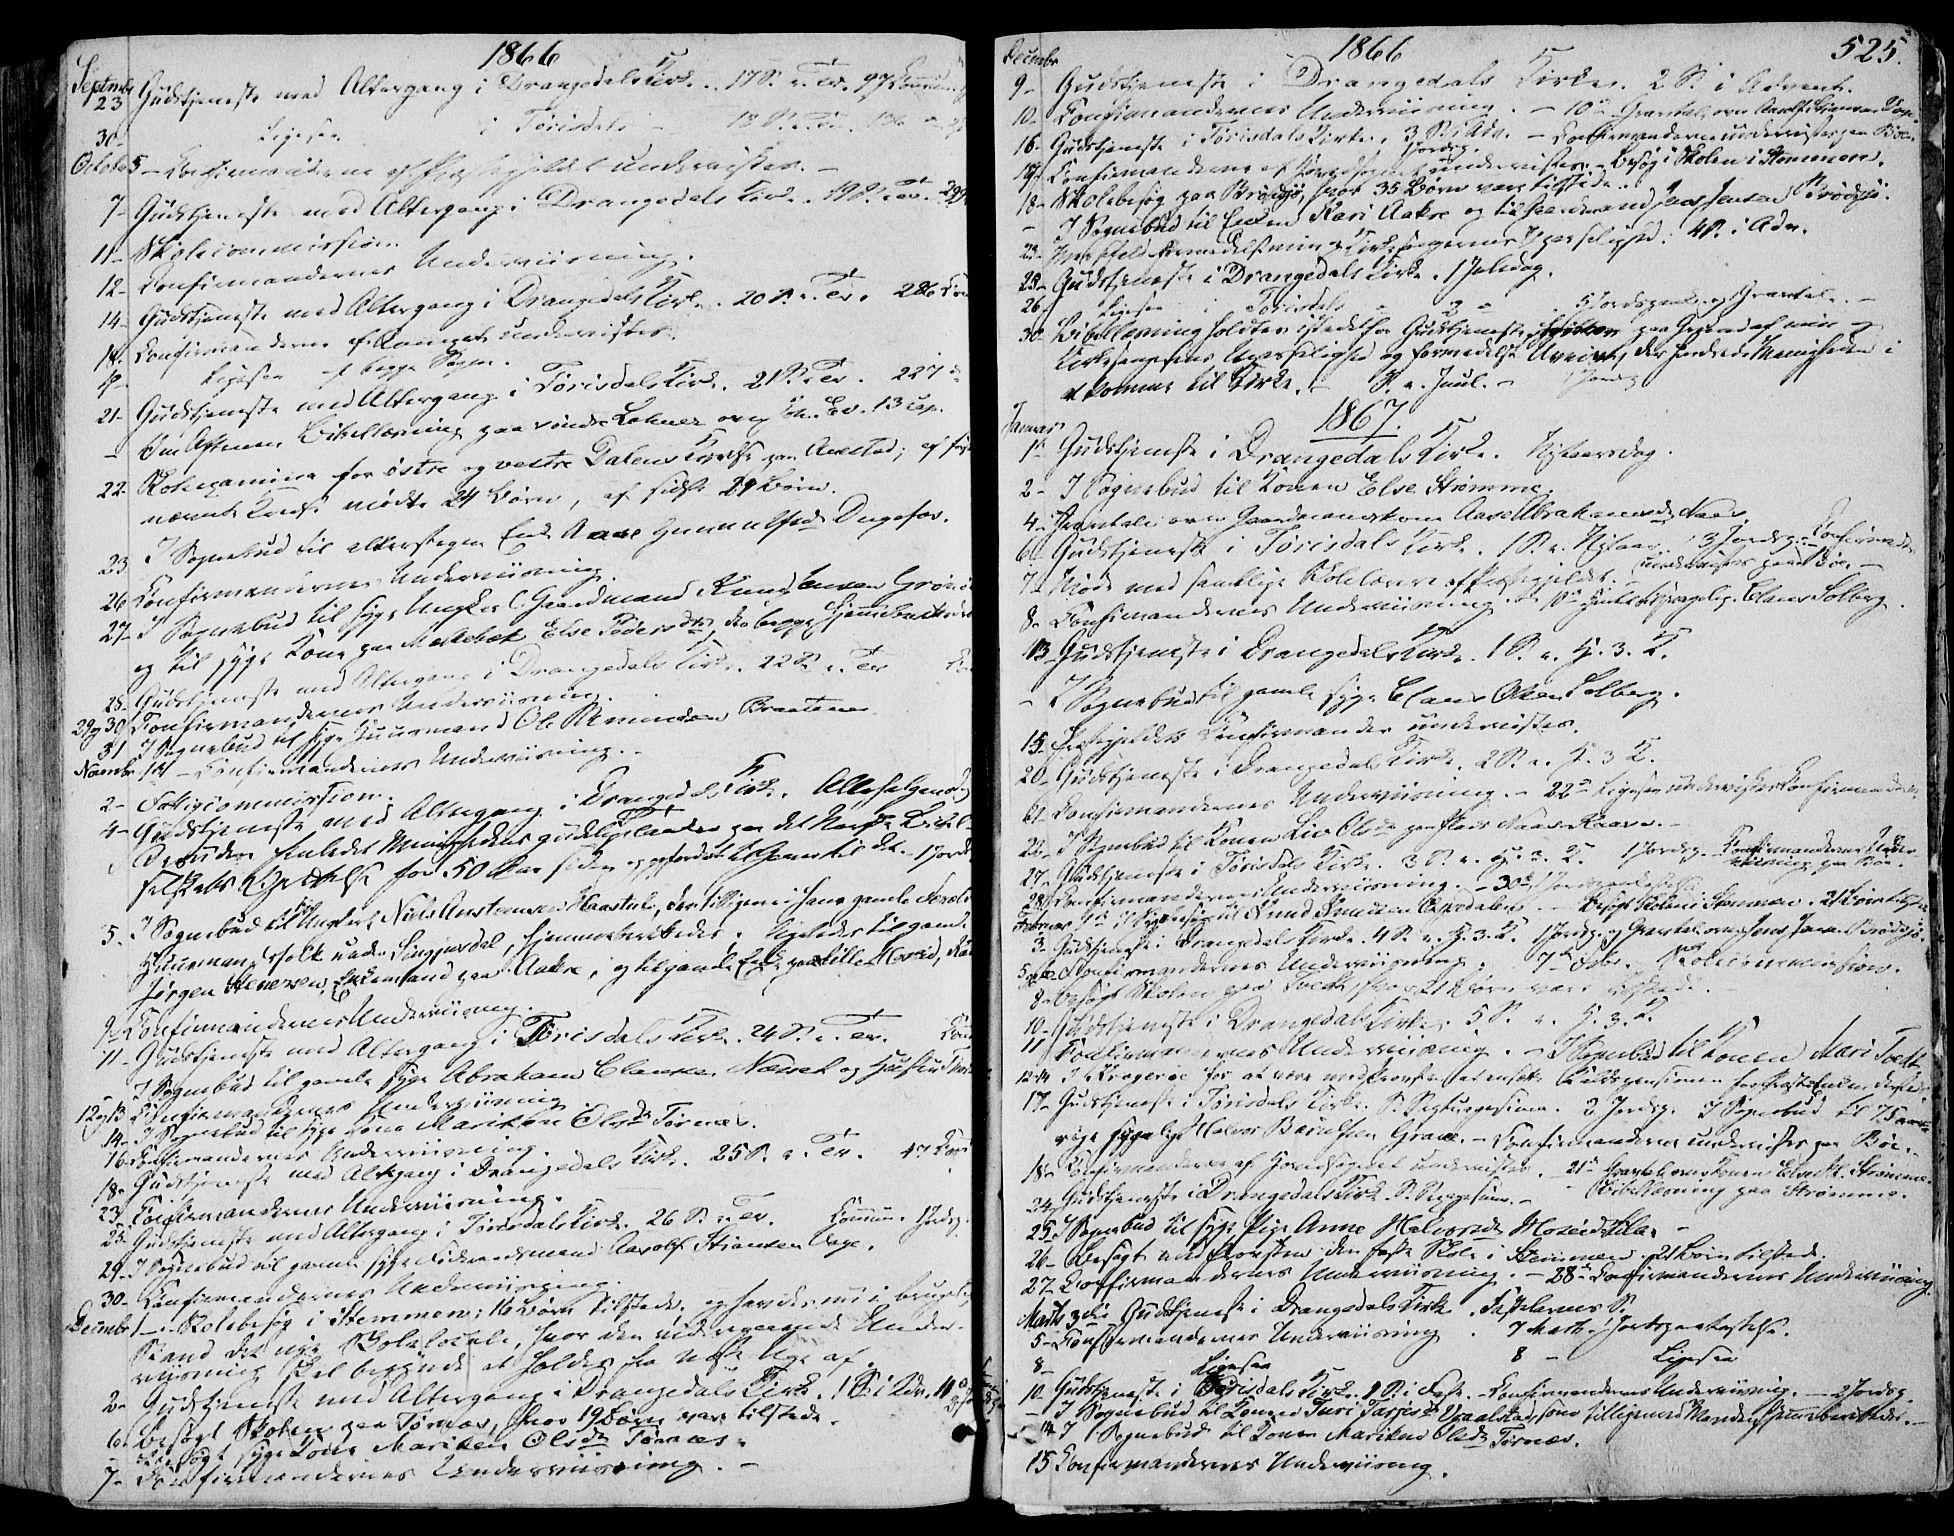 SAKO, Drangedal kirkebøker, F/Fa/L0008: Ministerialbok nr. 8, 1857-1871, s. 525